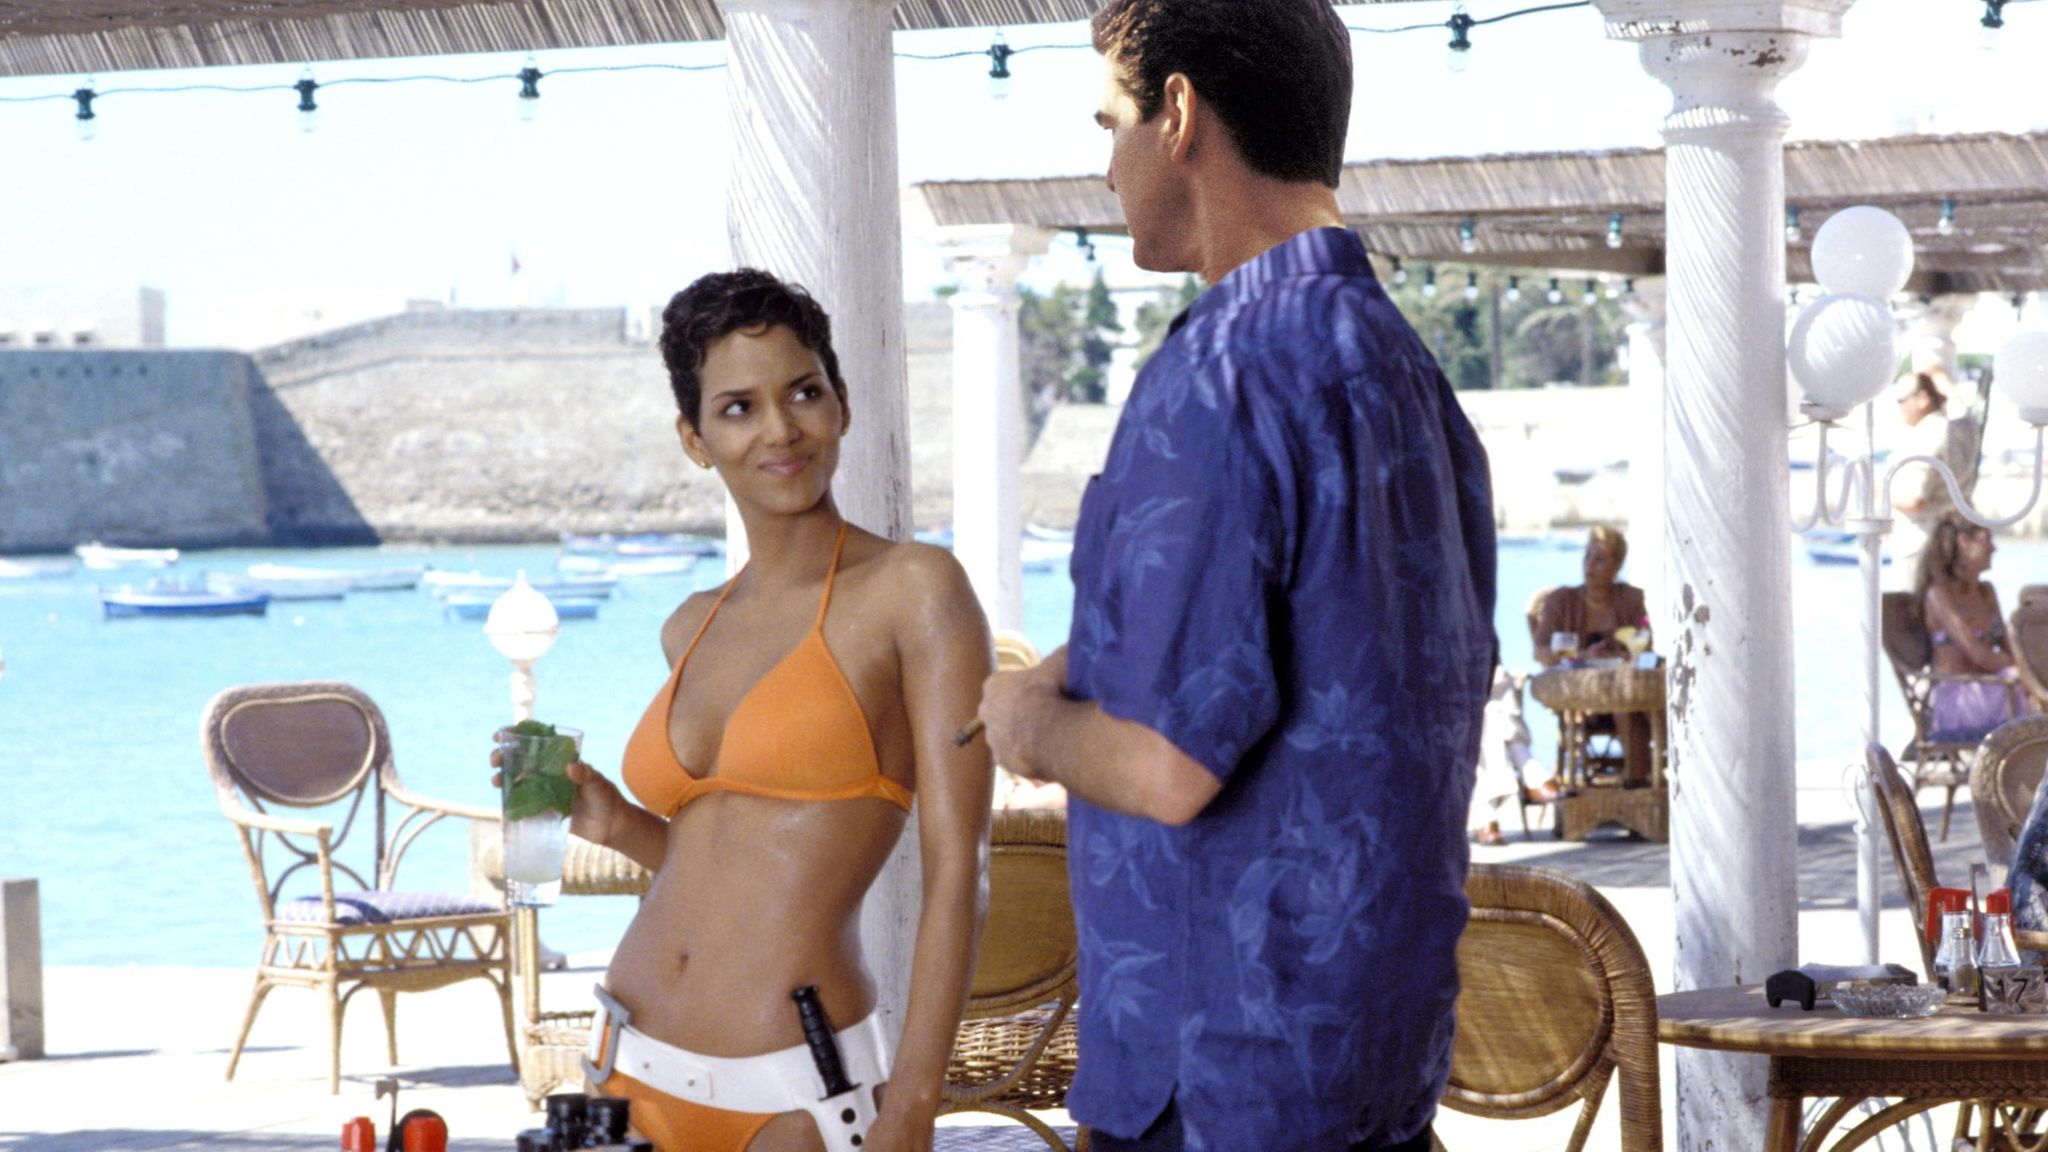 Die Another Day - 2002 Halle Berry, Pierce Brosnan